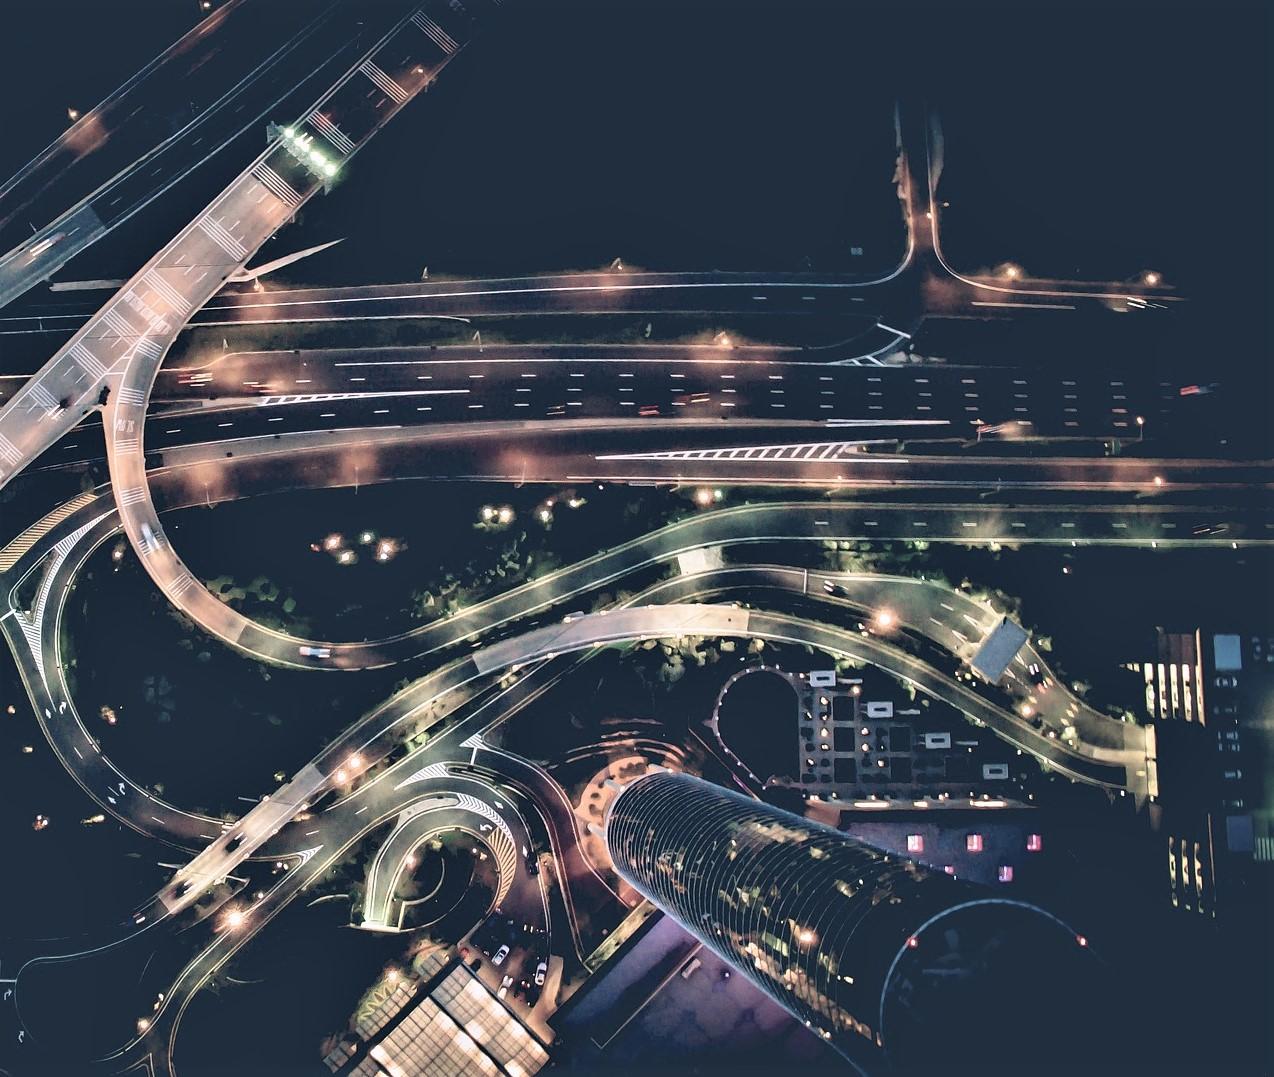 Civil engineer Michael Demanega mobility Innovation